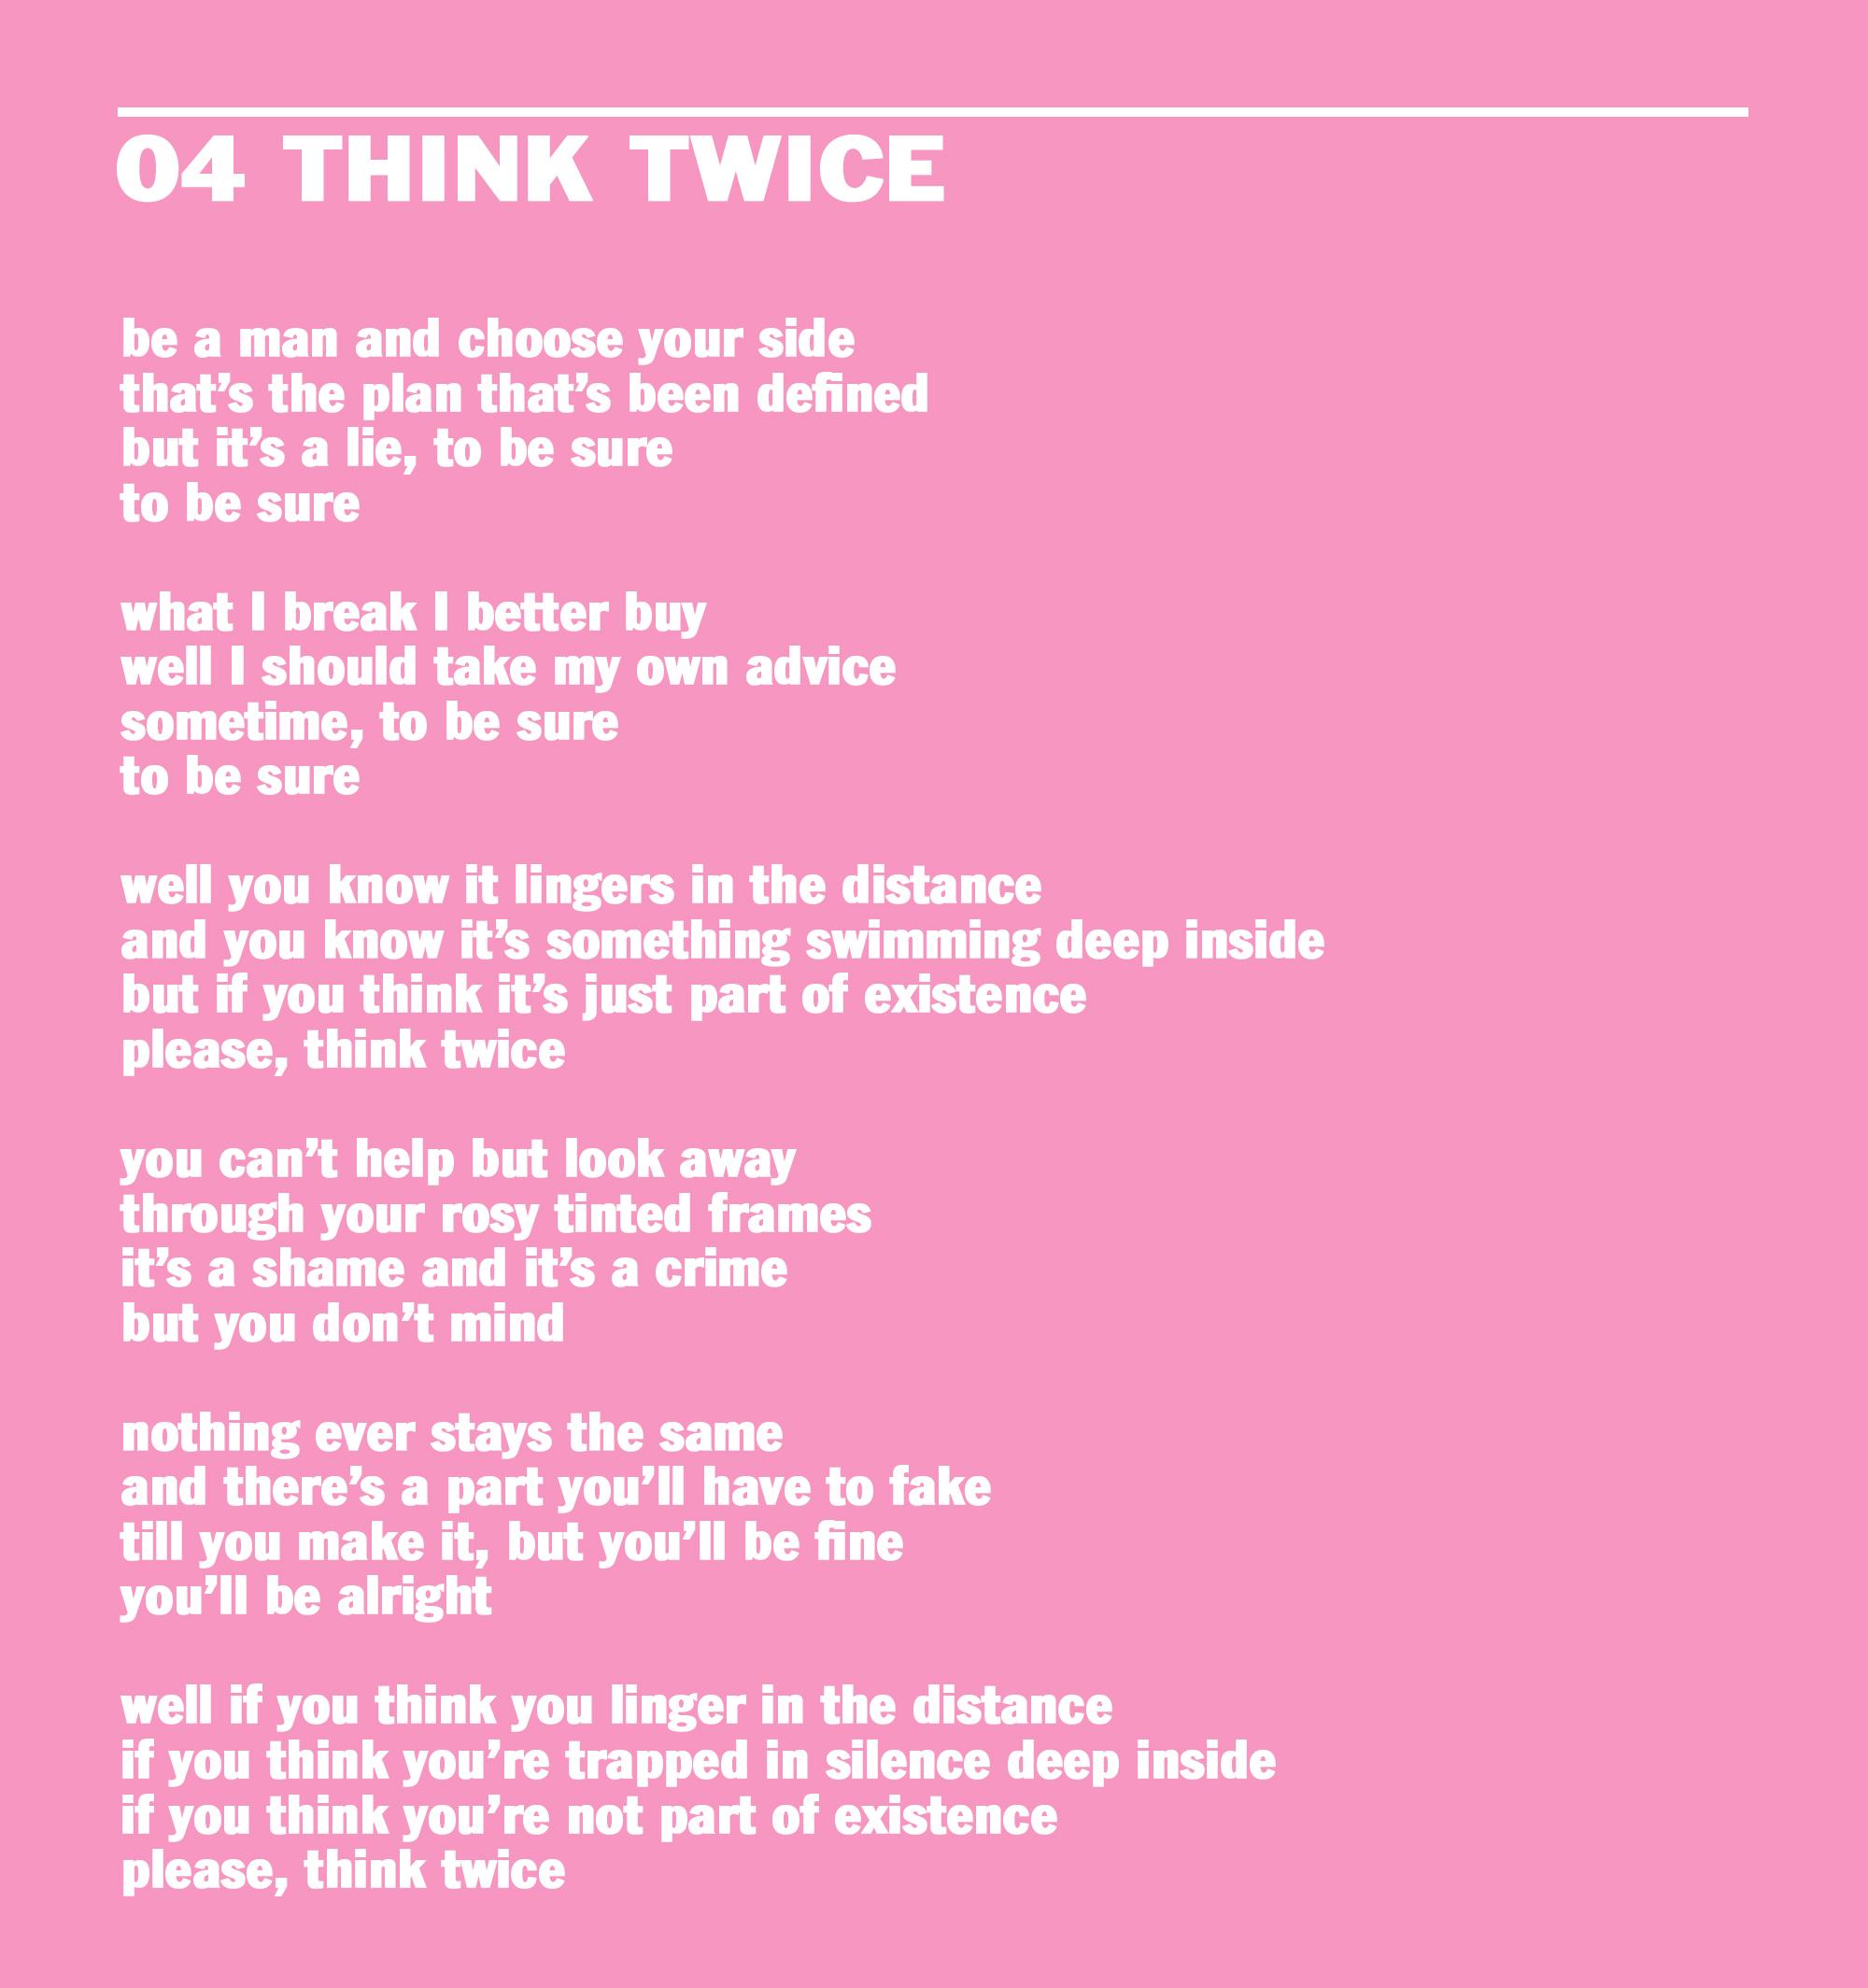 web lyrics think twice.jpg